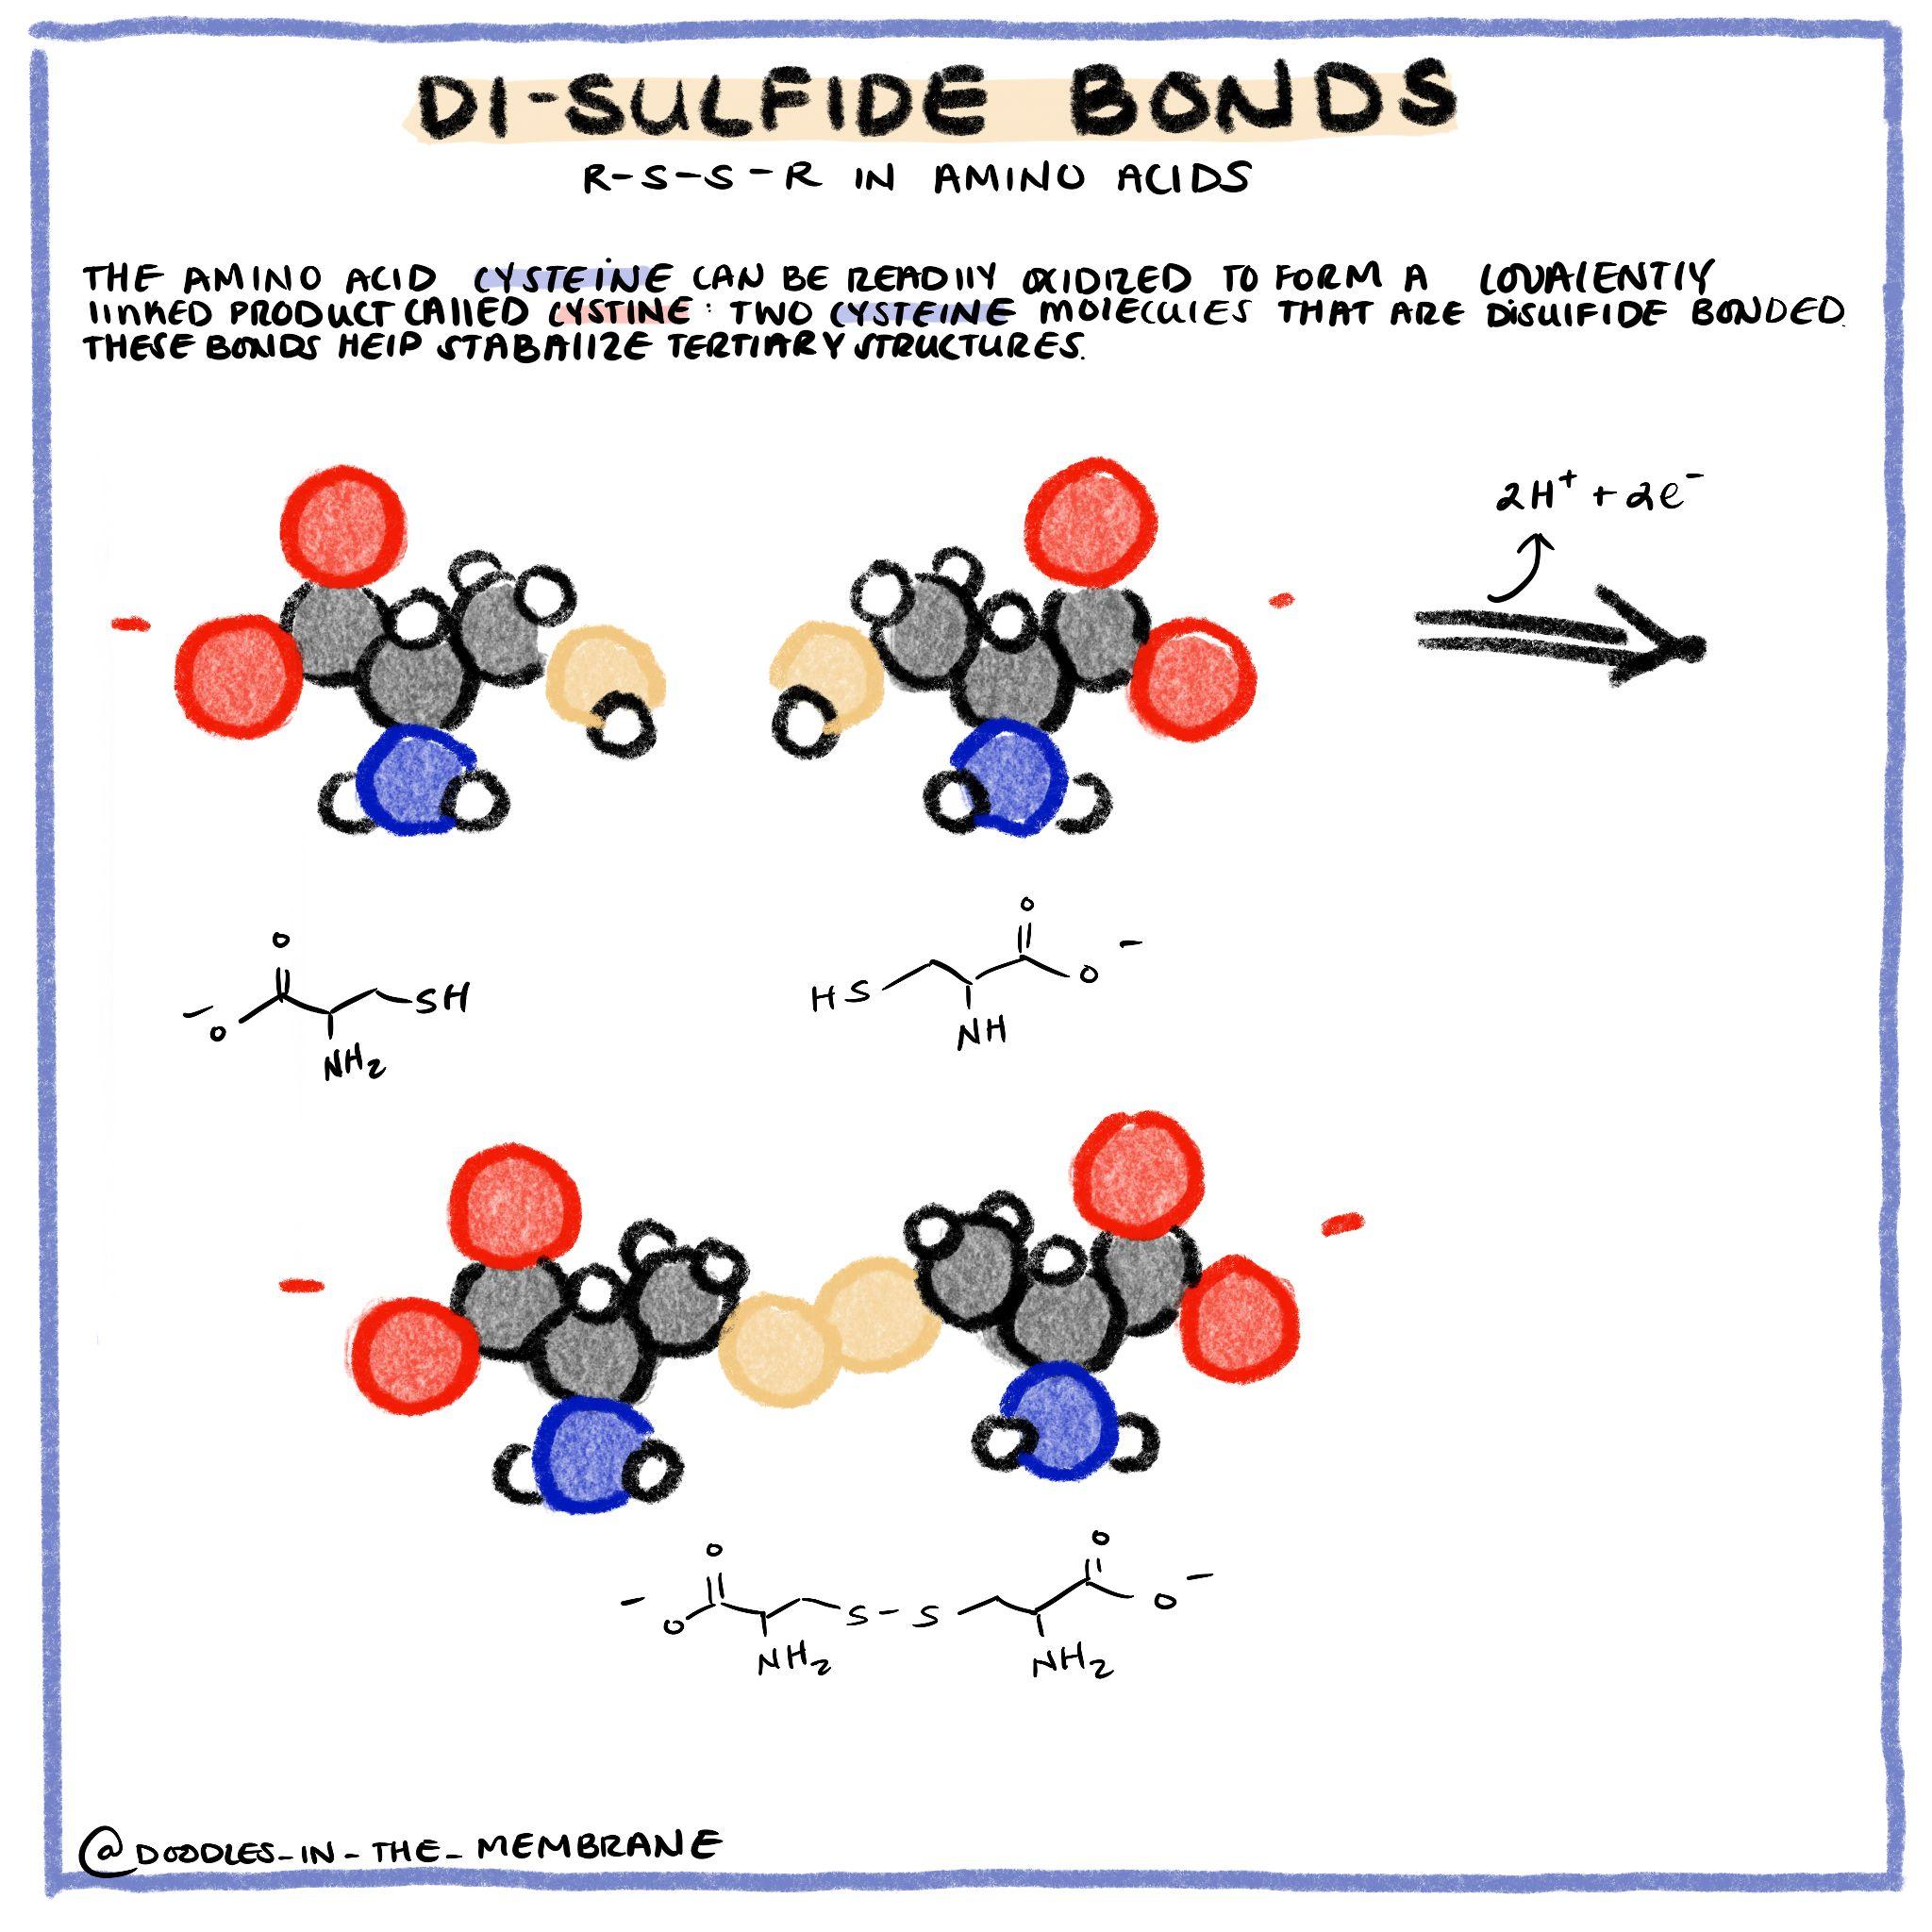 Biochemistry Infographic Disulfide Bonding In